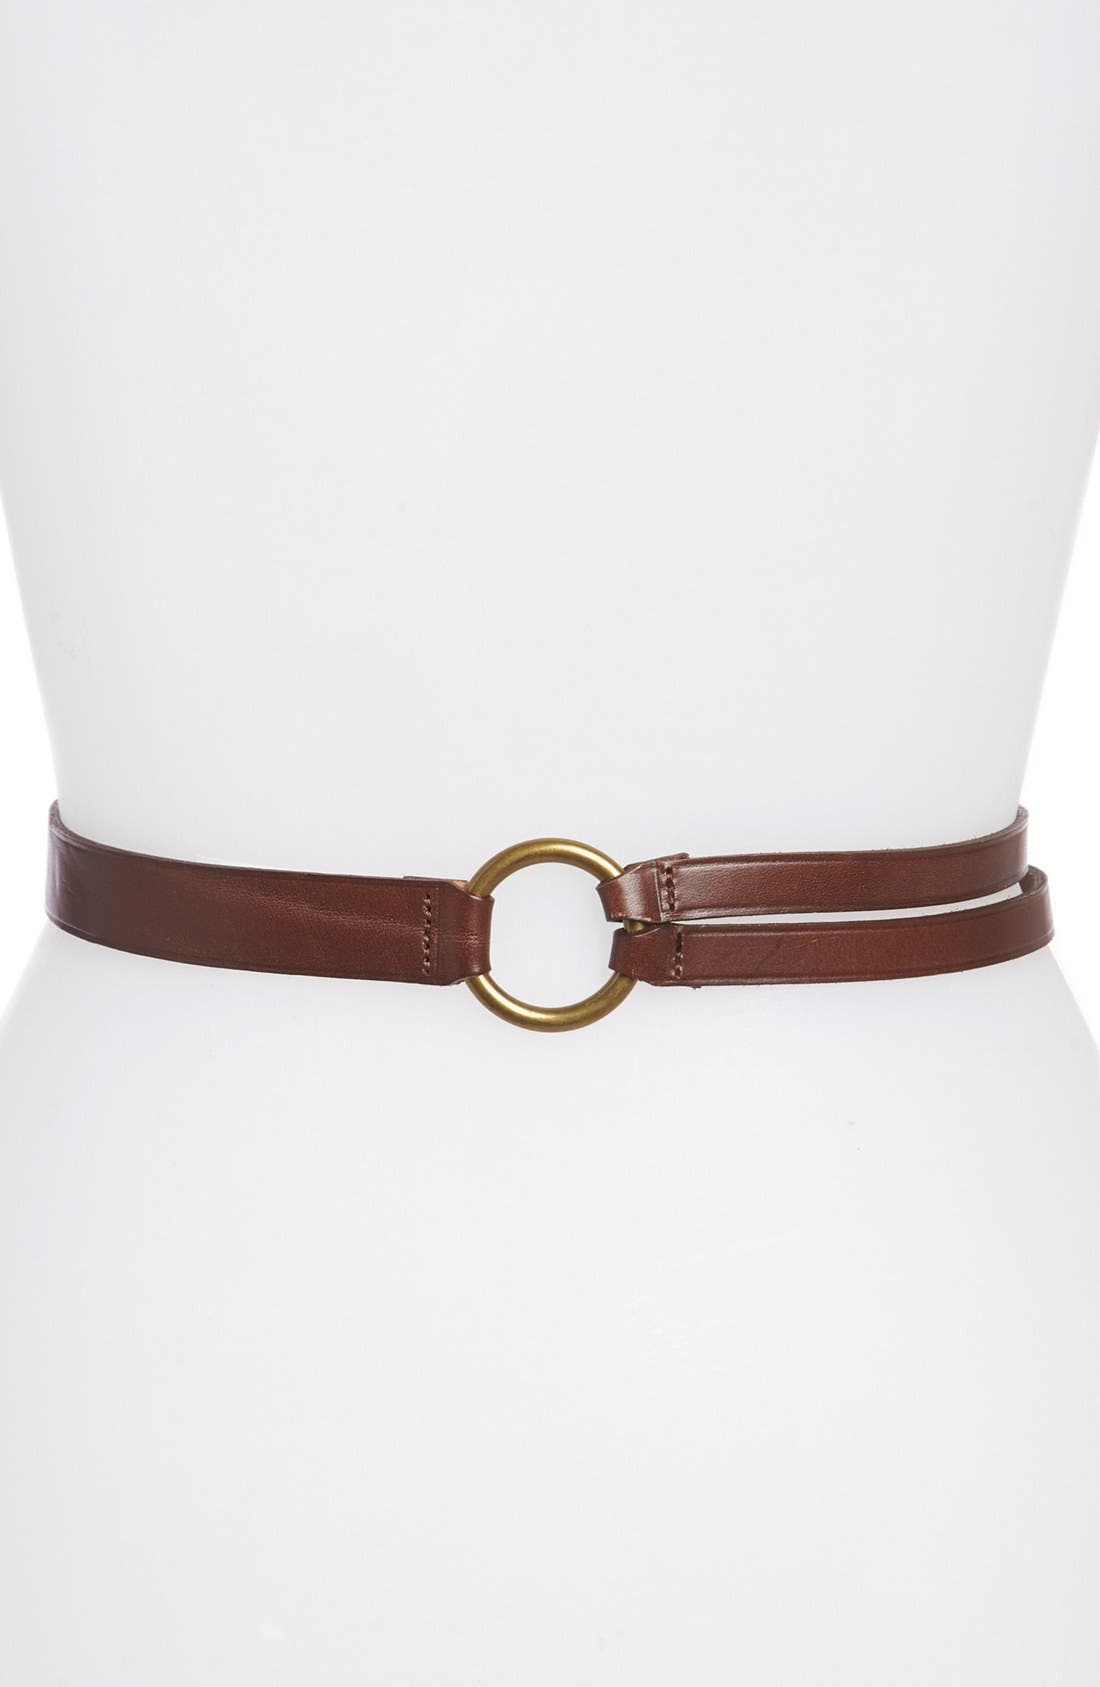 Alternate Image 2  - Lauren Ralph Lauren Tri-Strap Belt